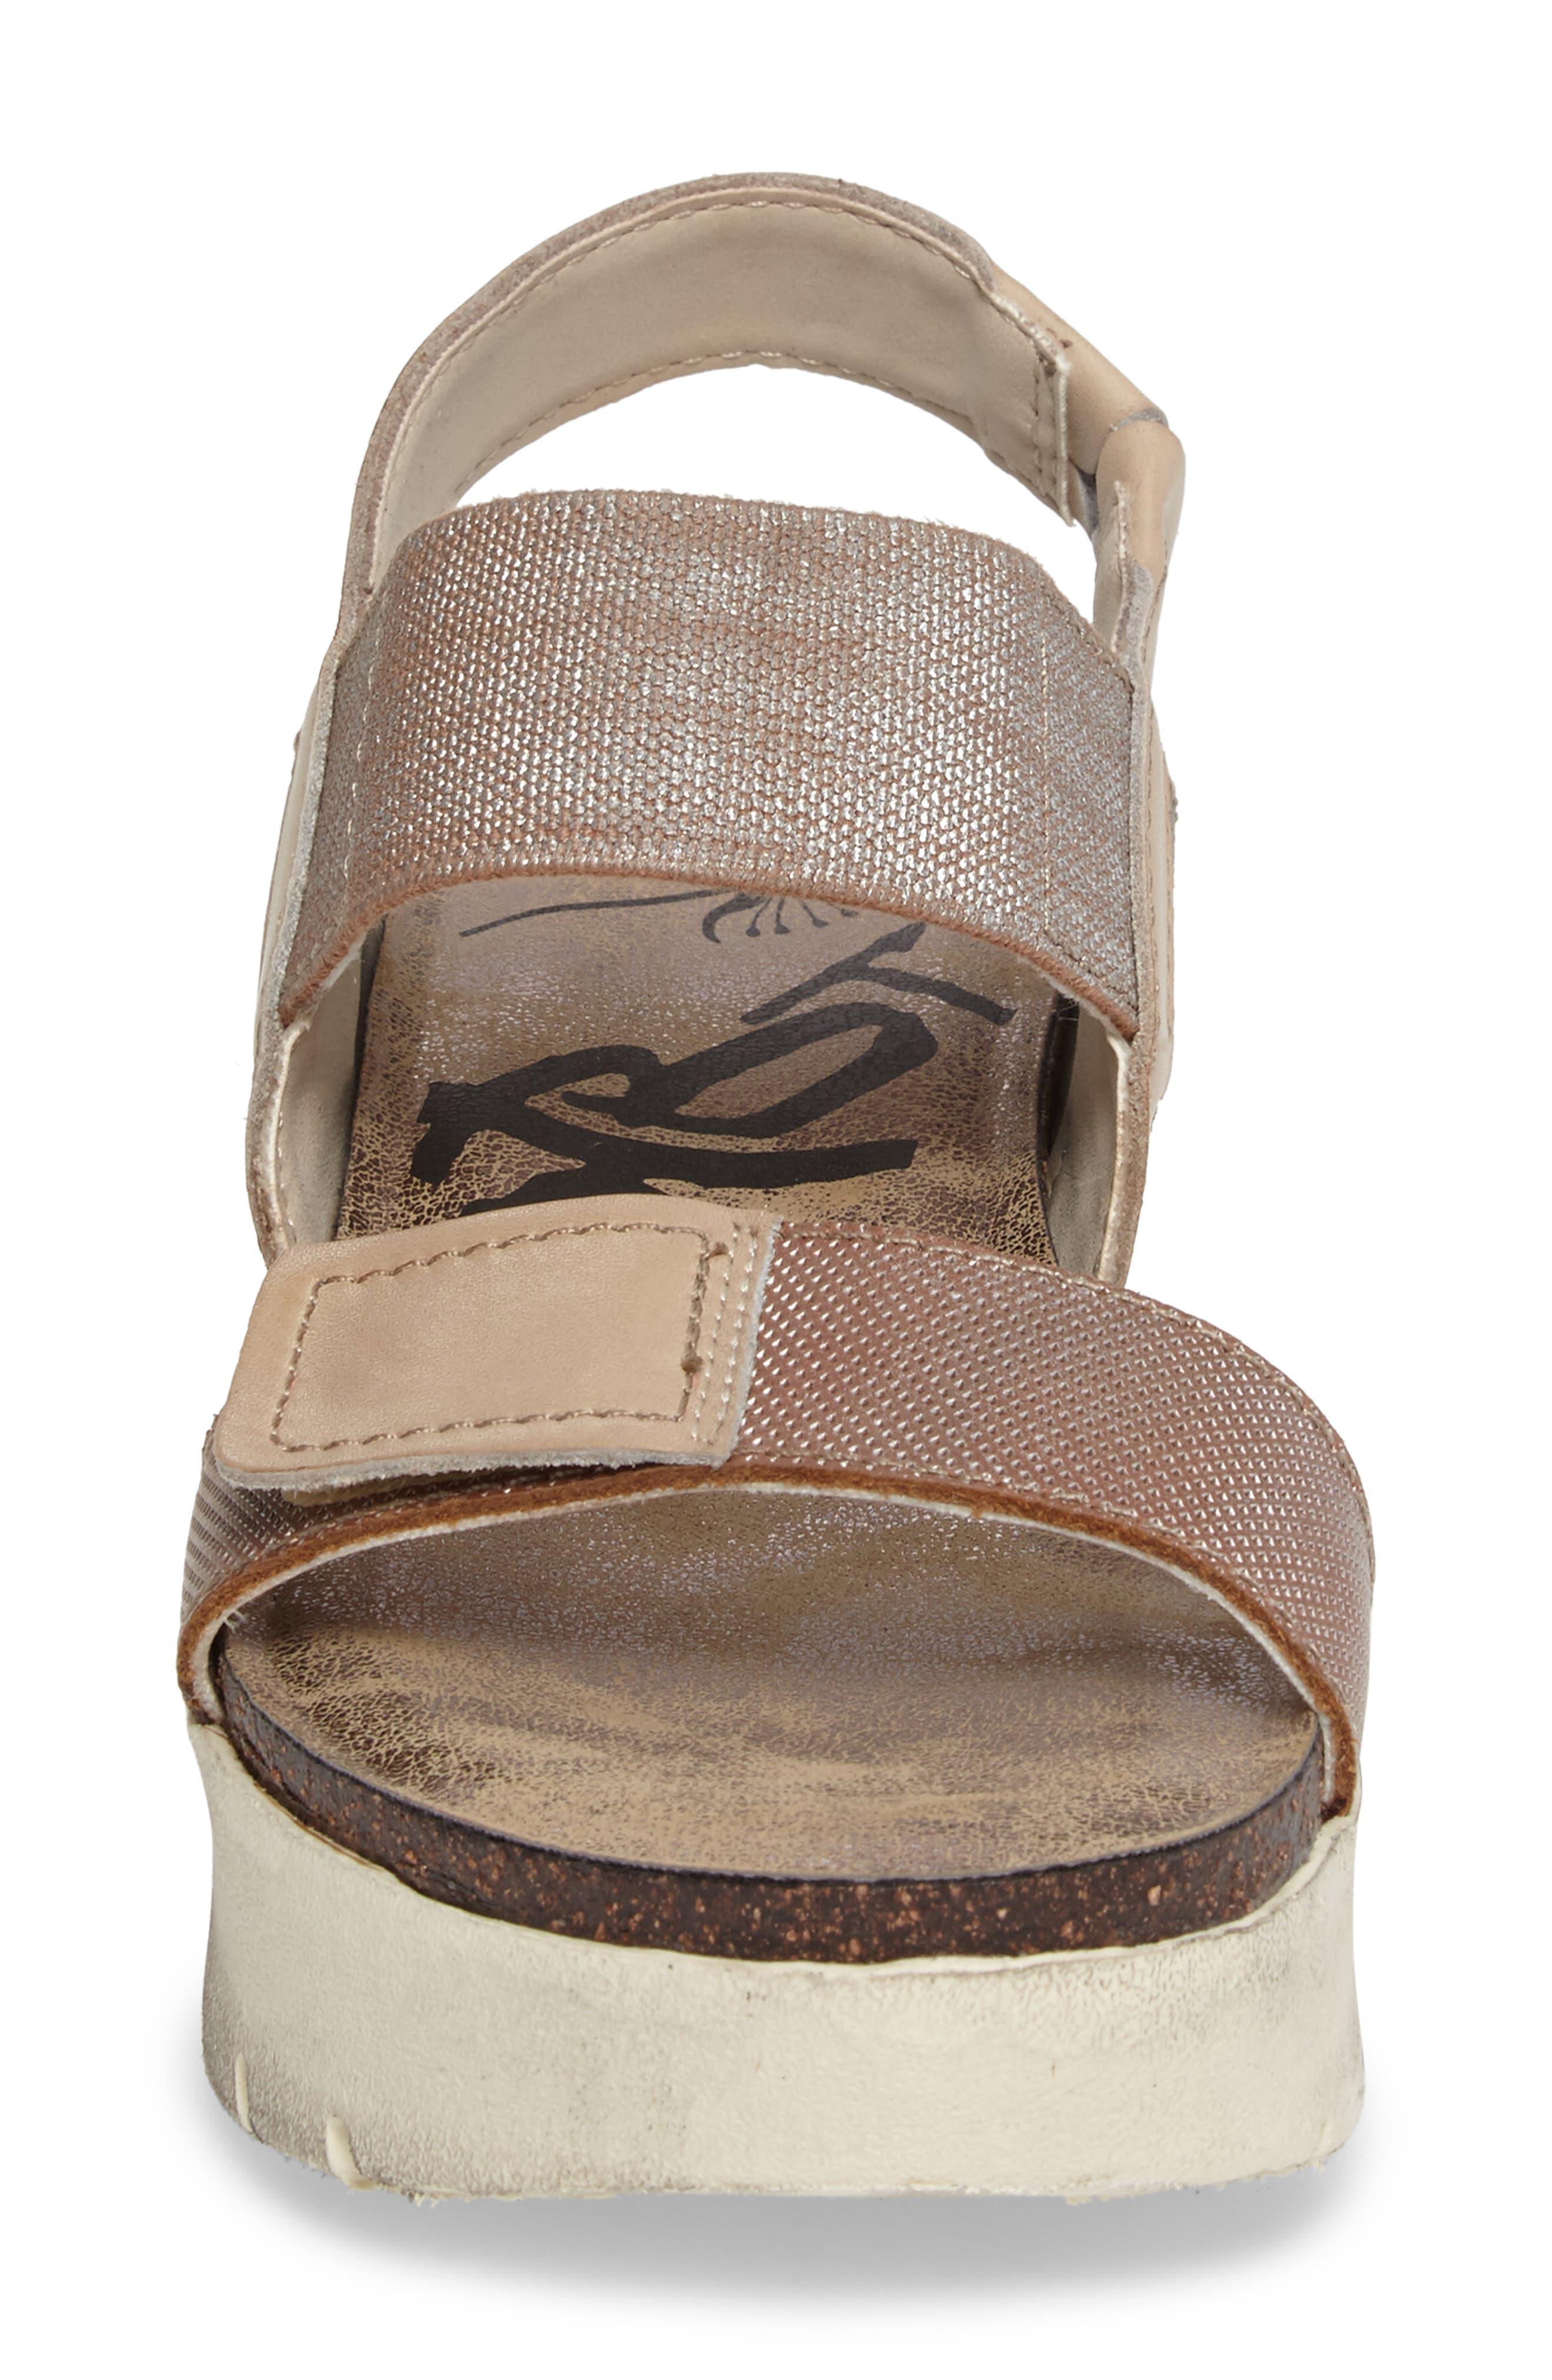 Nova Platform Sandal,                             Alternate thumbnail 4, color,                             SILVER LEATHER